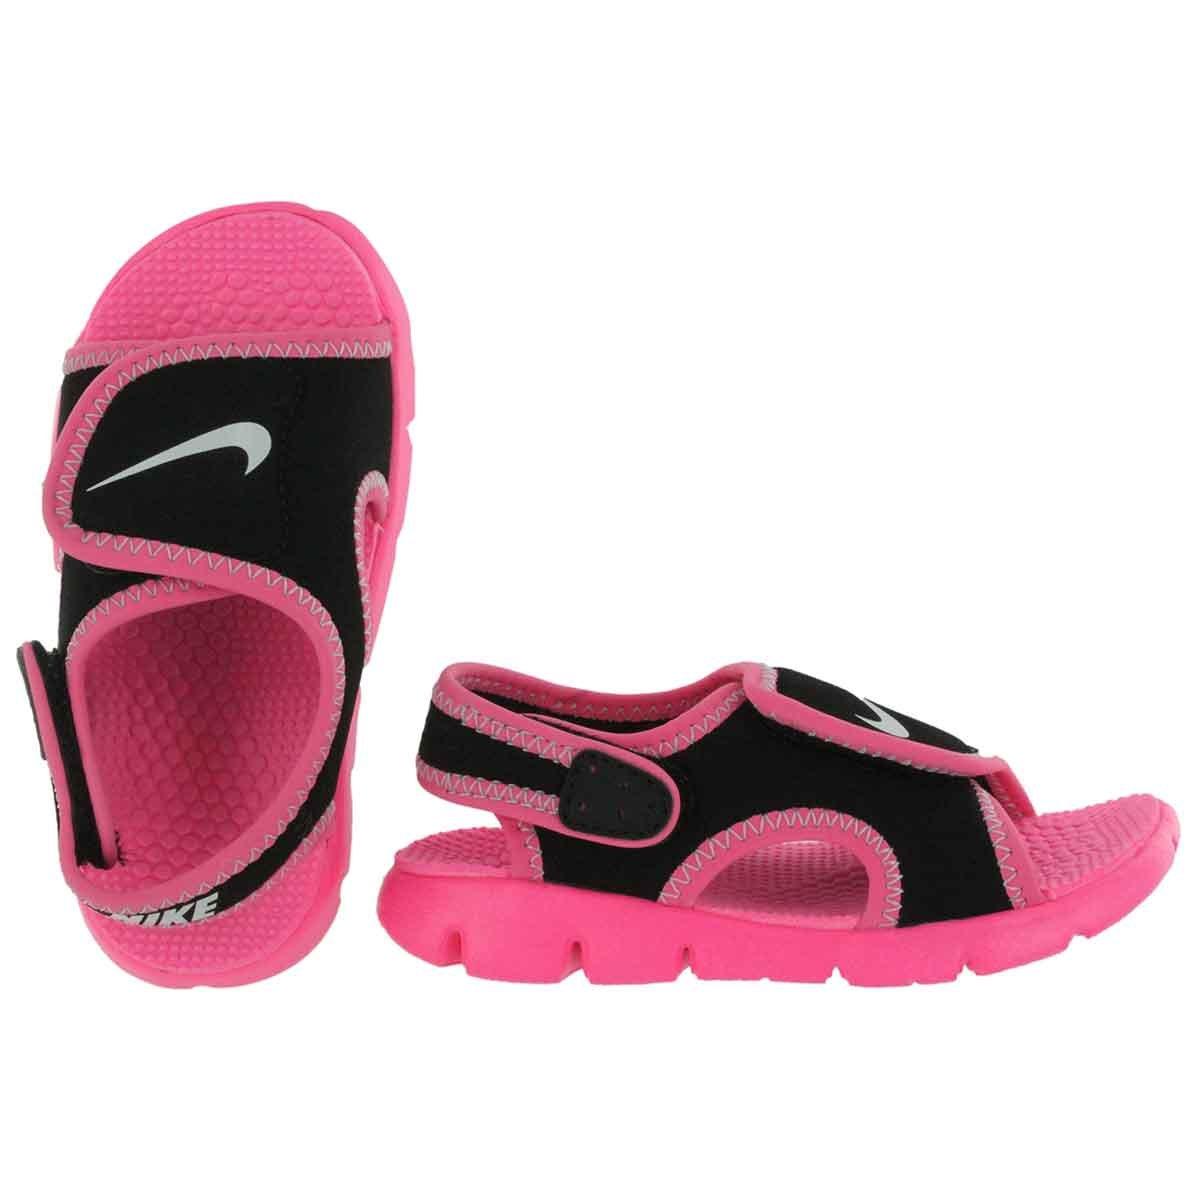 561f23d76d8da Black Pink Nike SUNRAY ADJUST 4 (TD) Open Toe Sandals Shoes Girls Toddlers  Size 12 12c 386521 001